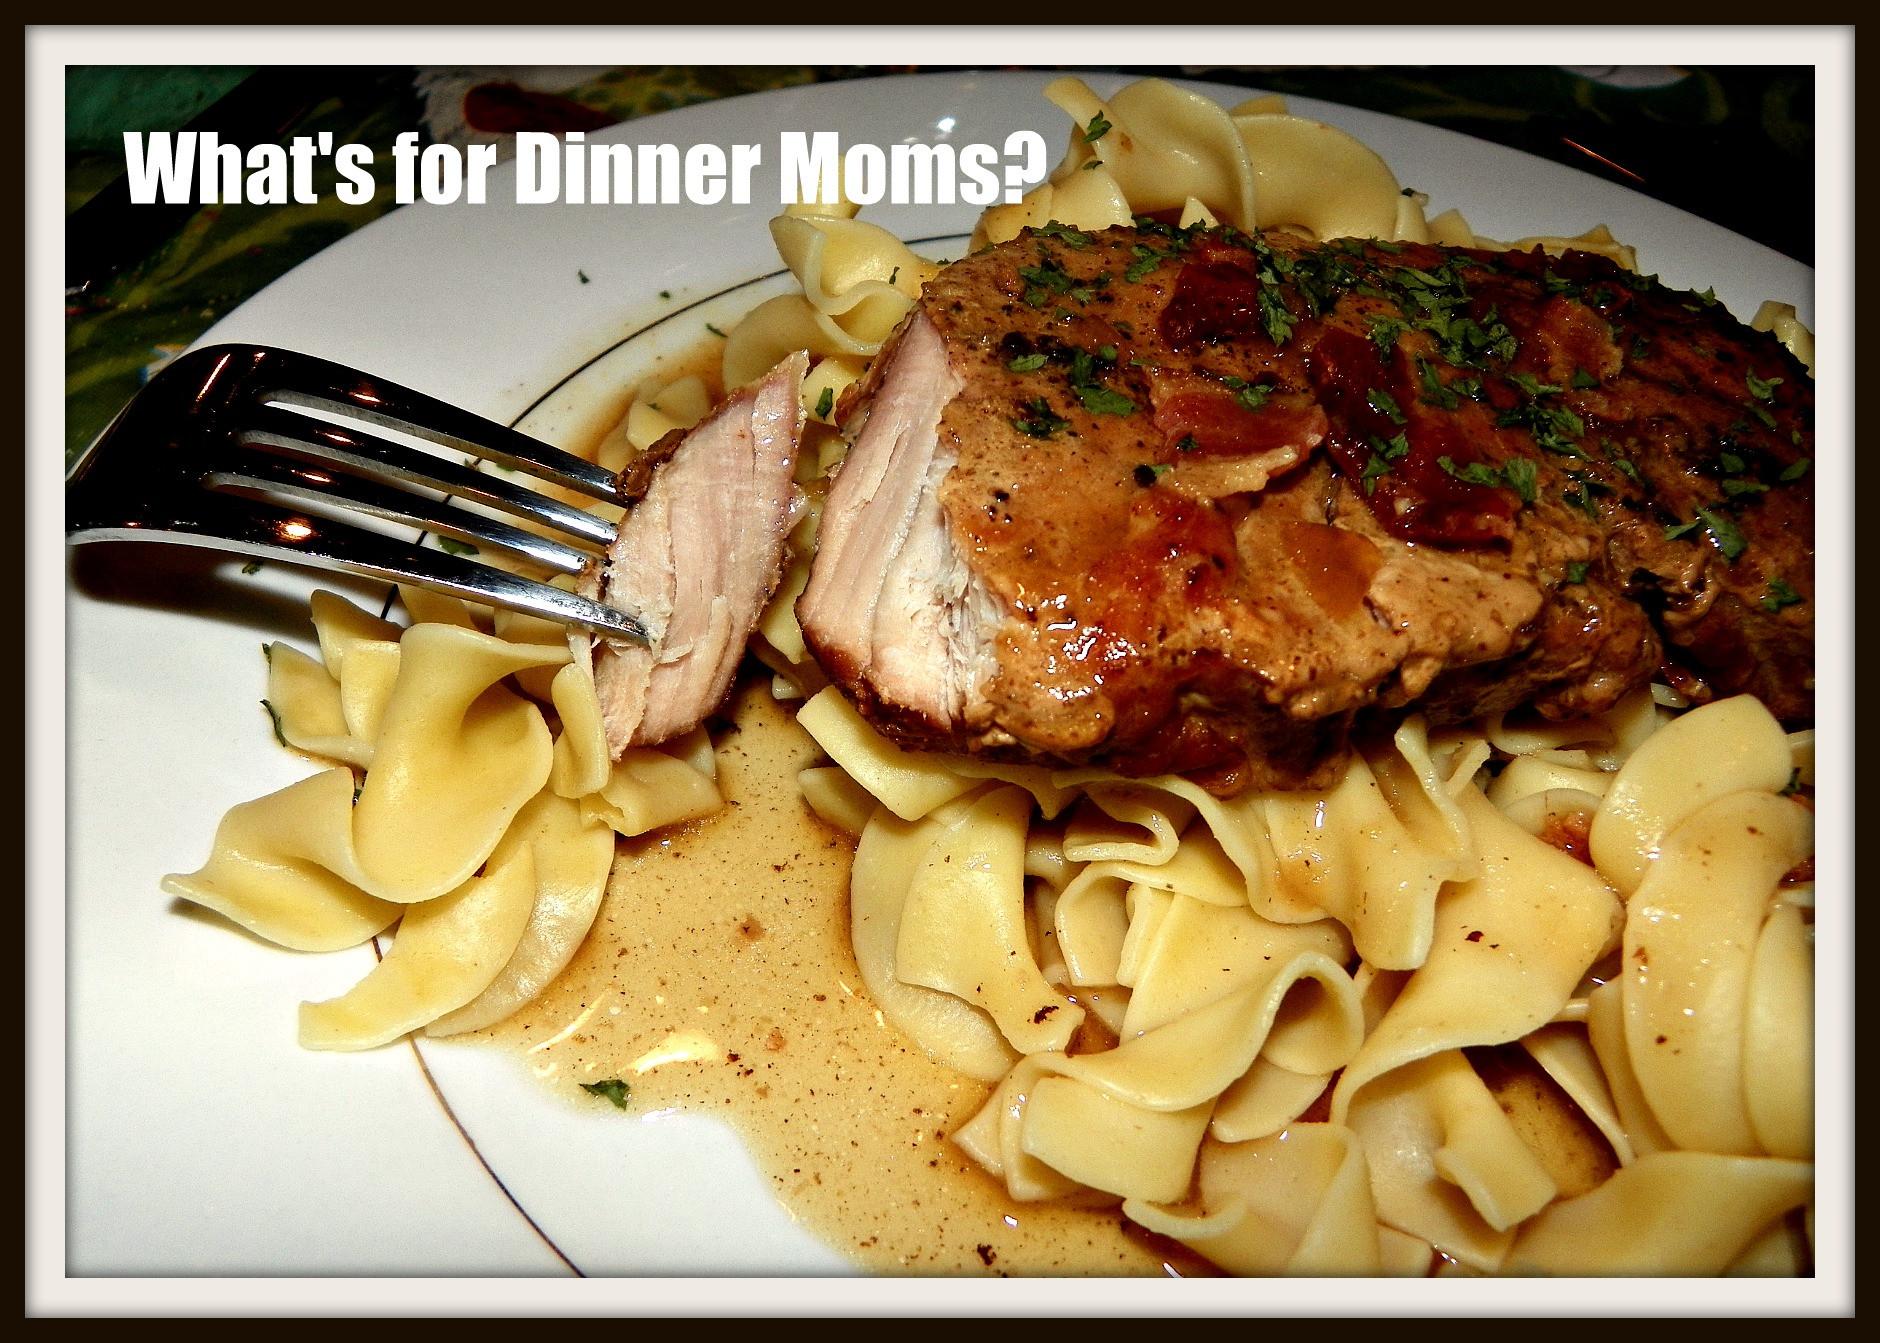 Slow Cooker Boneless Pork Chops  Slow Cooker Smothered Boneless Pork Chops – What s for